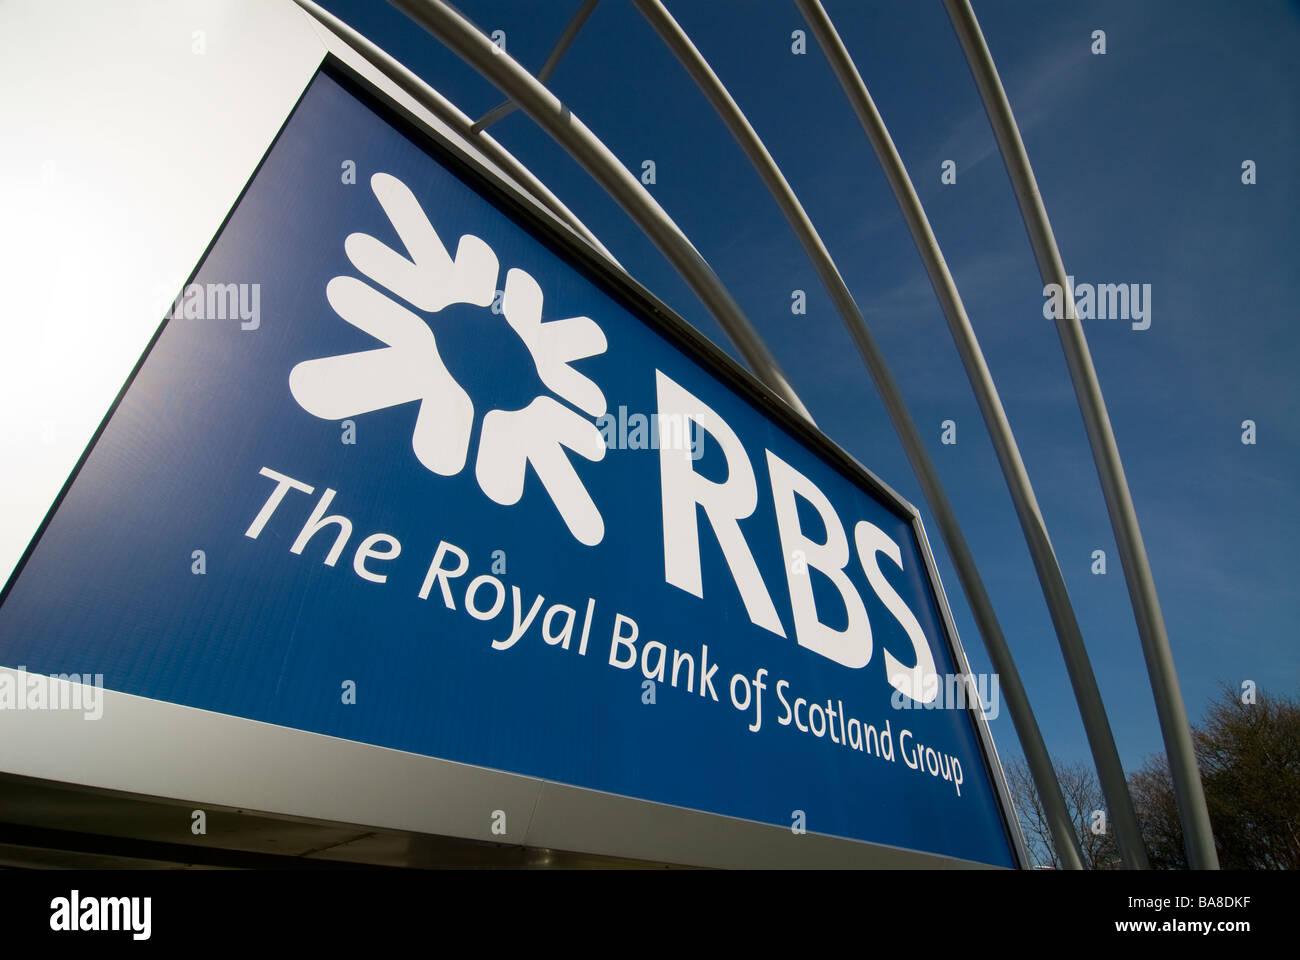 photograph of royal bank of scotland signage - Stock Image